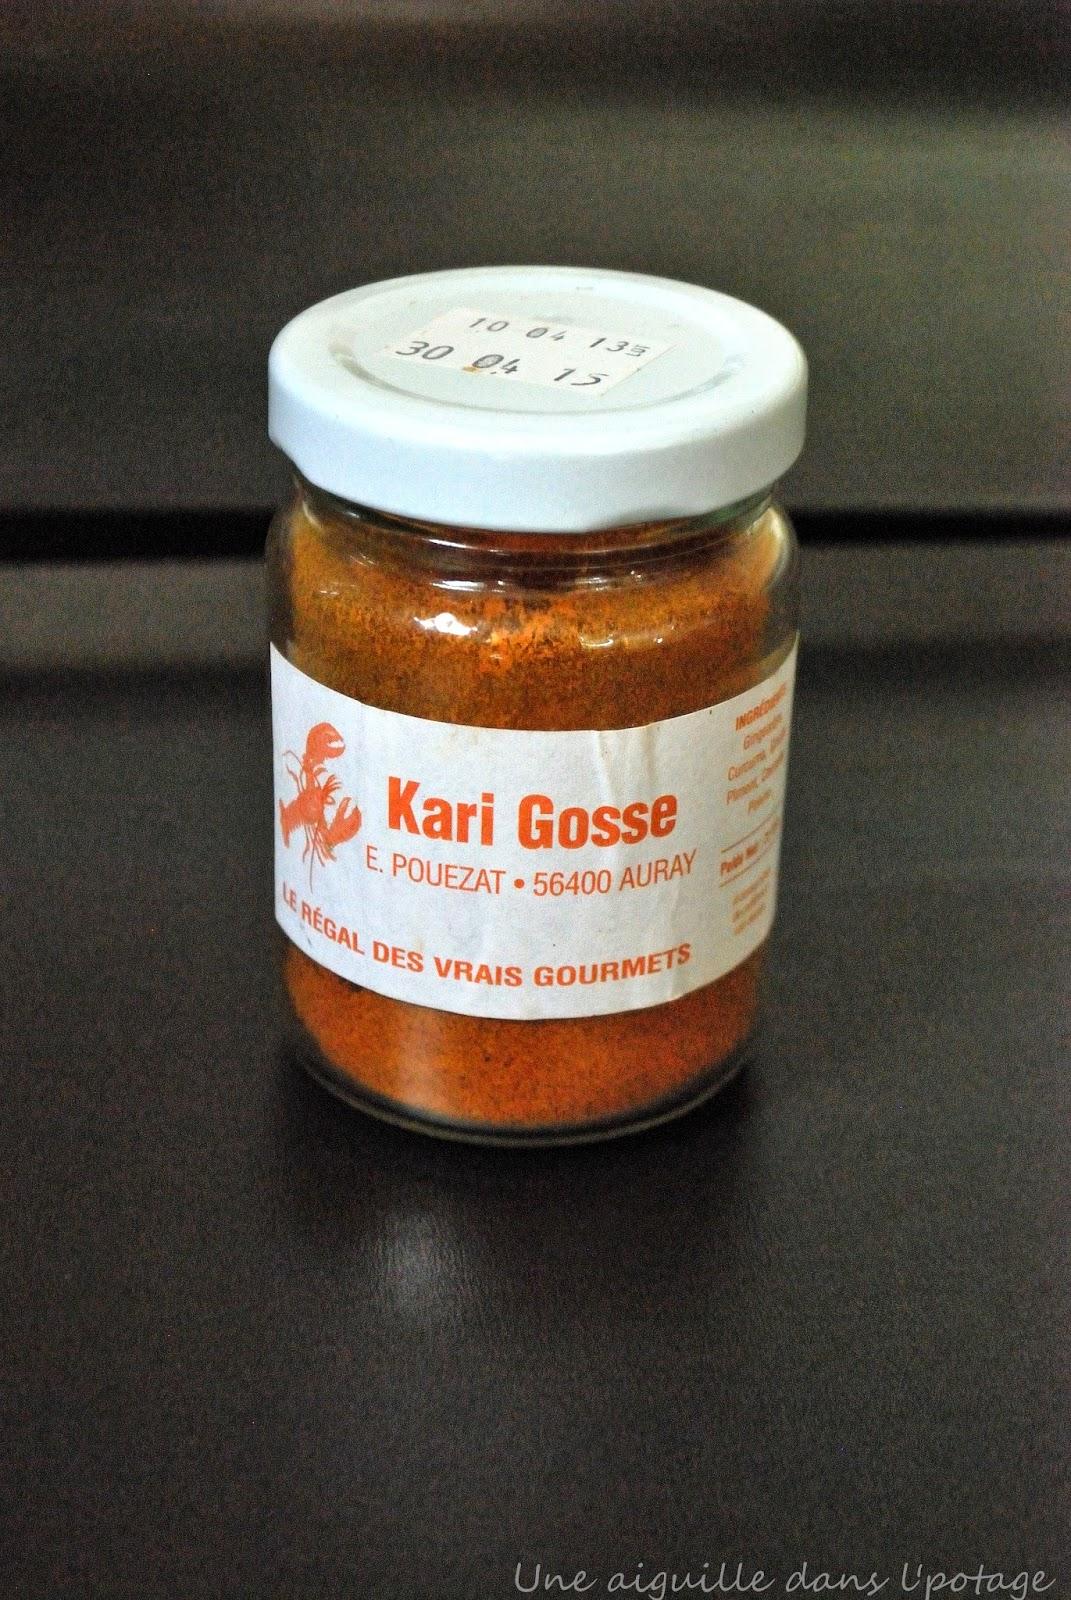 Flan de têtes de langoustines au Kari Gosse